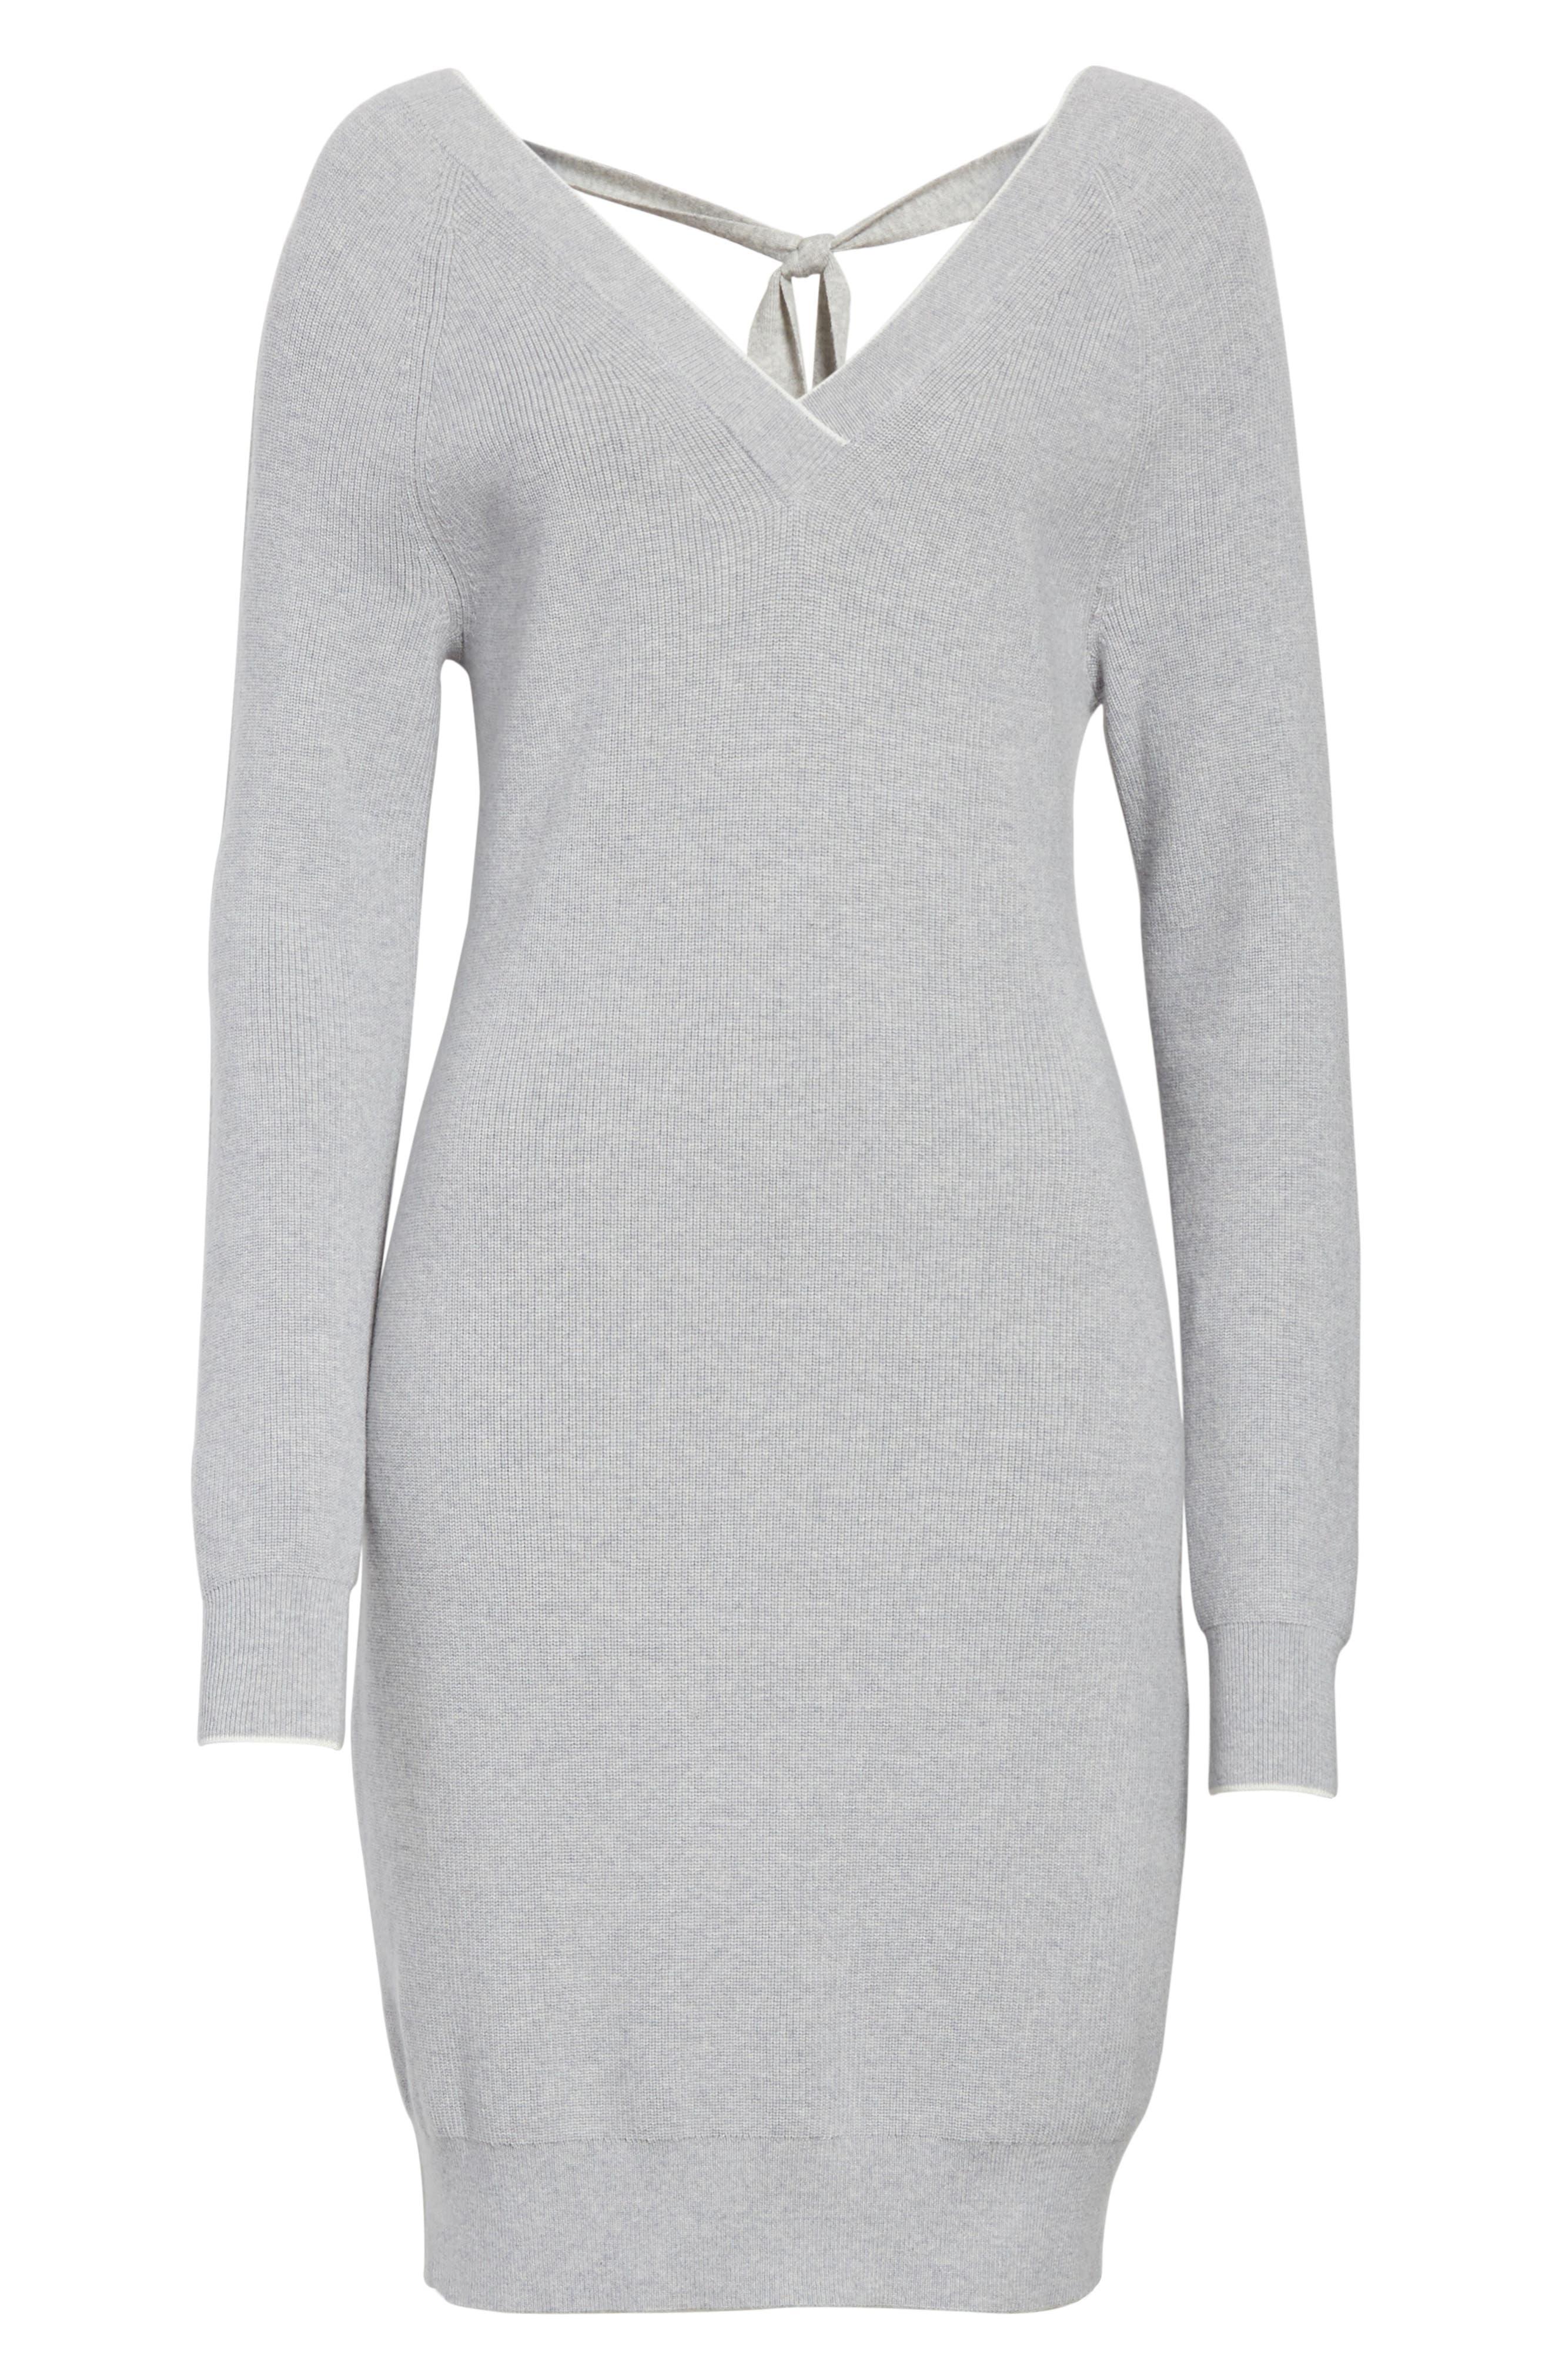 Wool Blend Sweater Dress,                             Alternate thumbnail 6, color,                             023